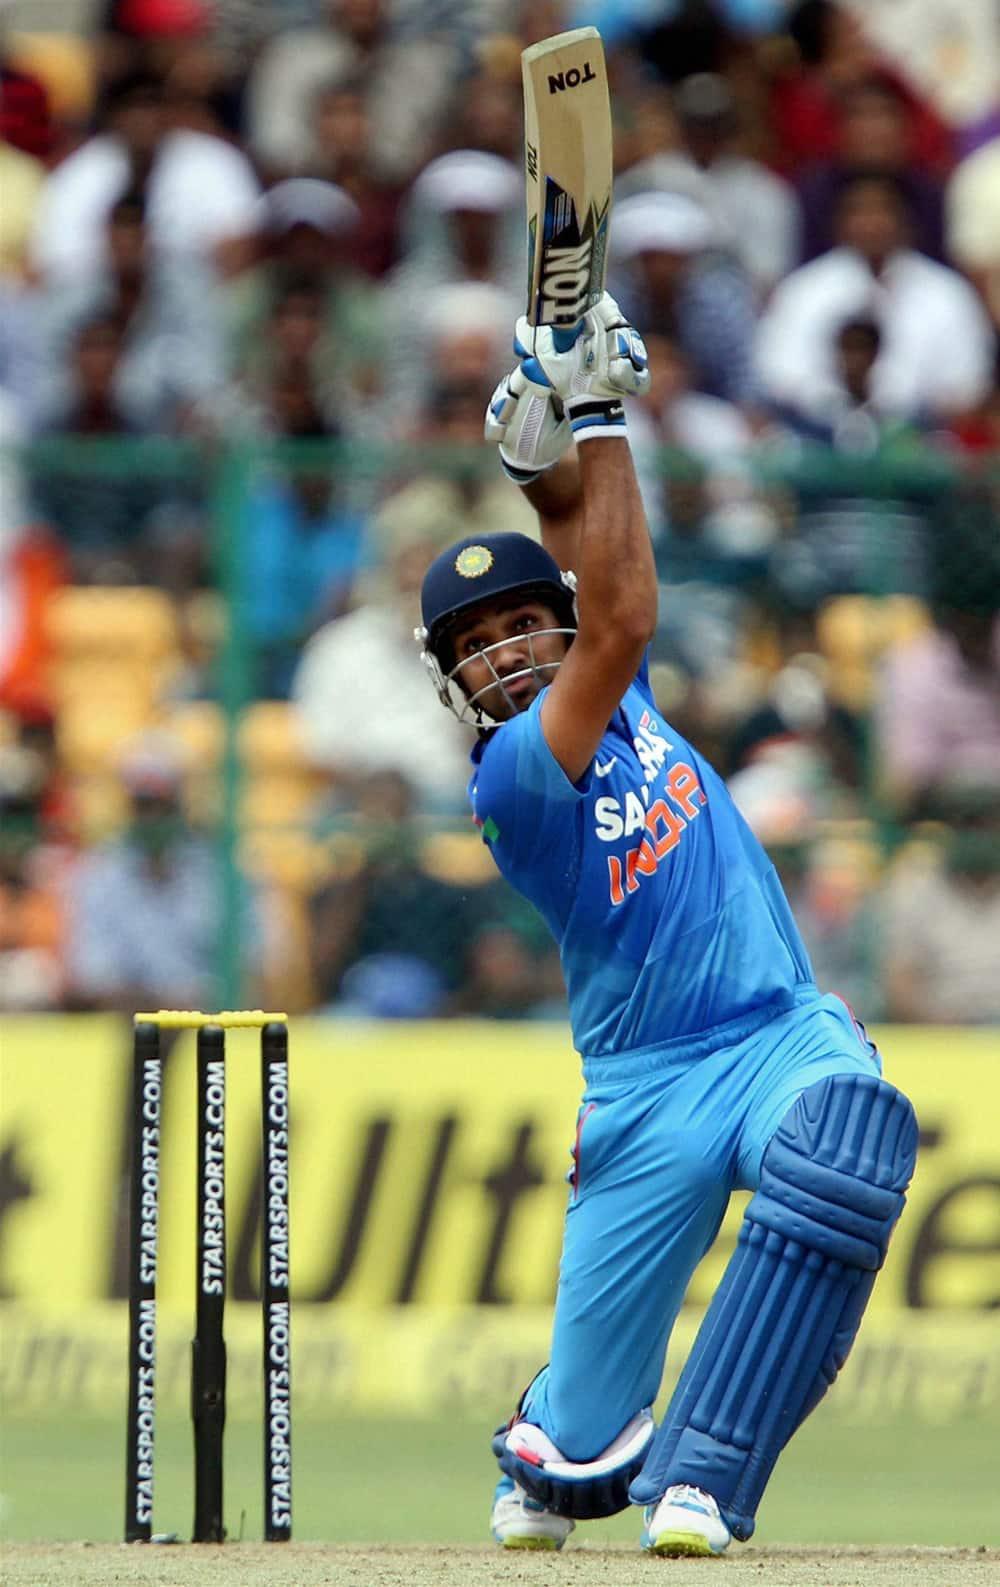 Rohit Sharma plays a shot during the 7th ODI cricket match against Australia at Chinnaswamy stadium in Bengaluru.